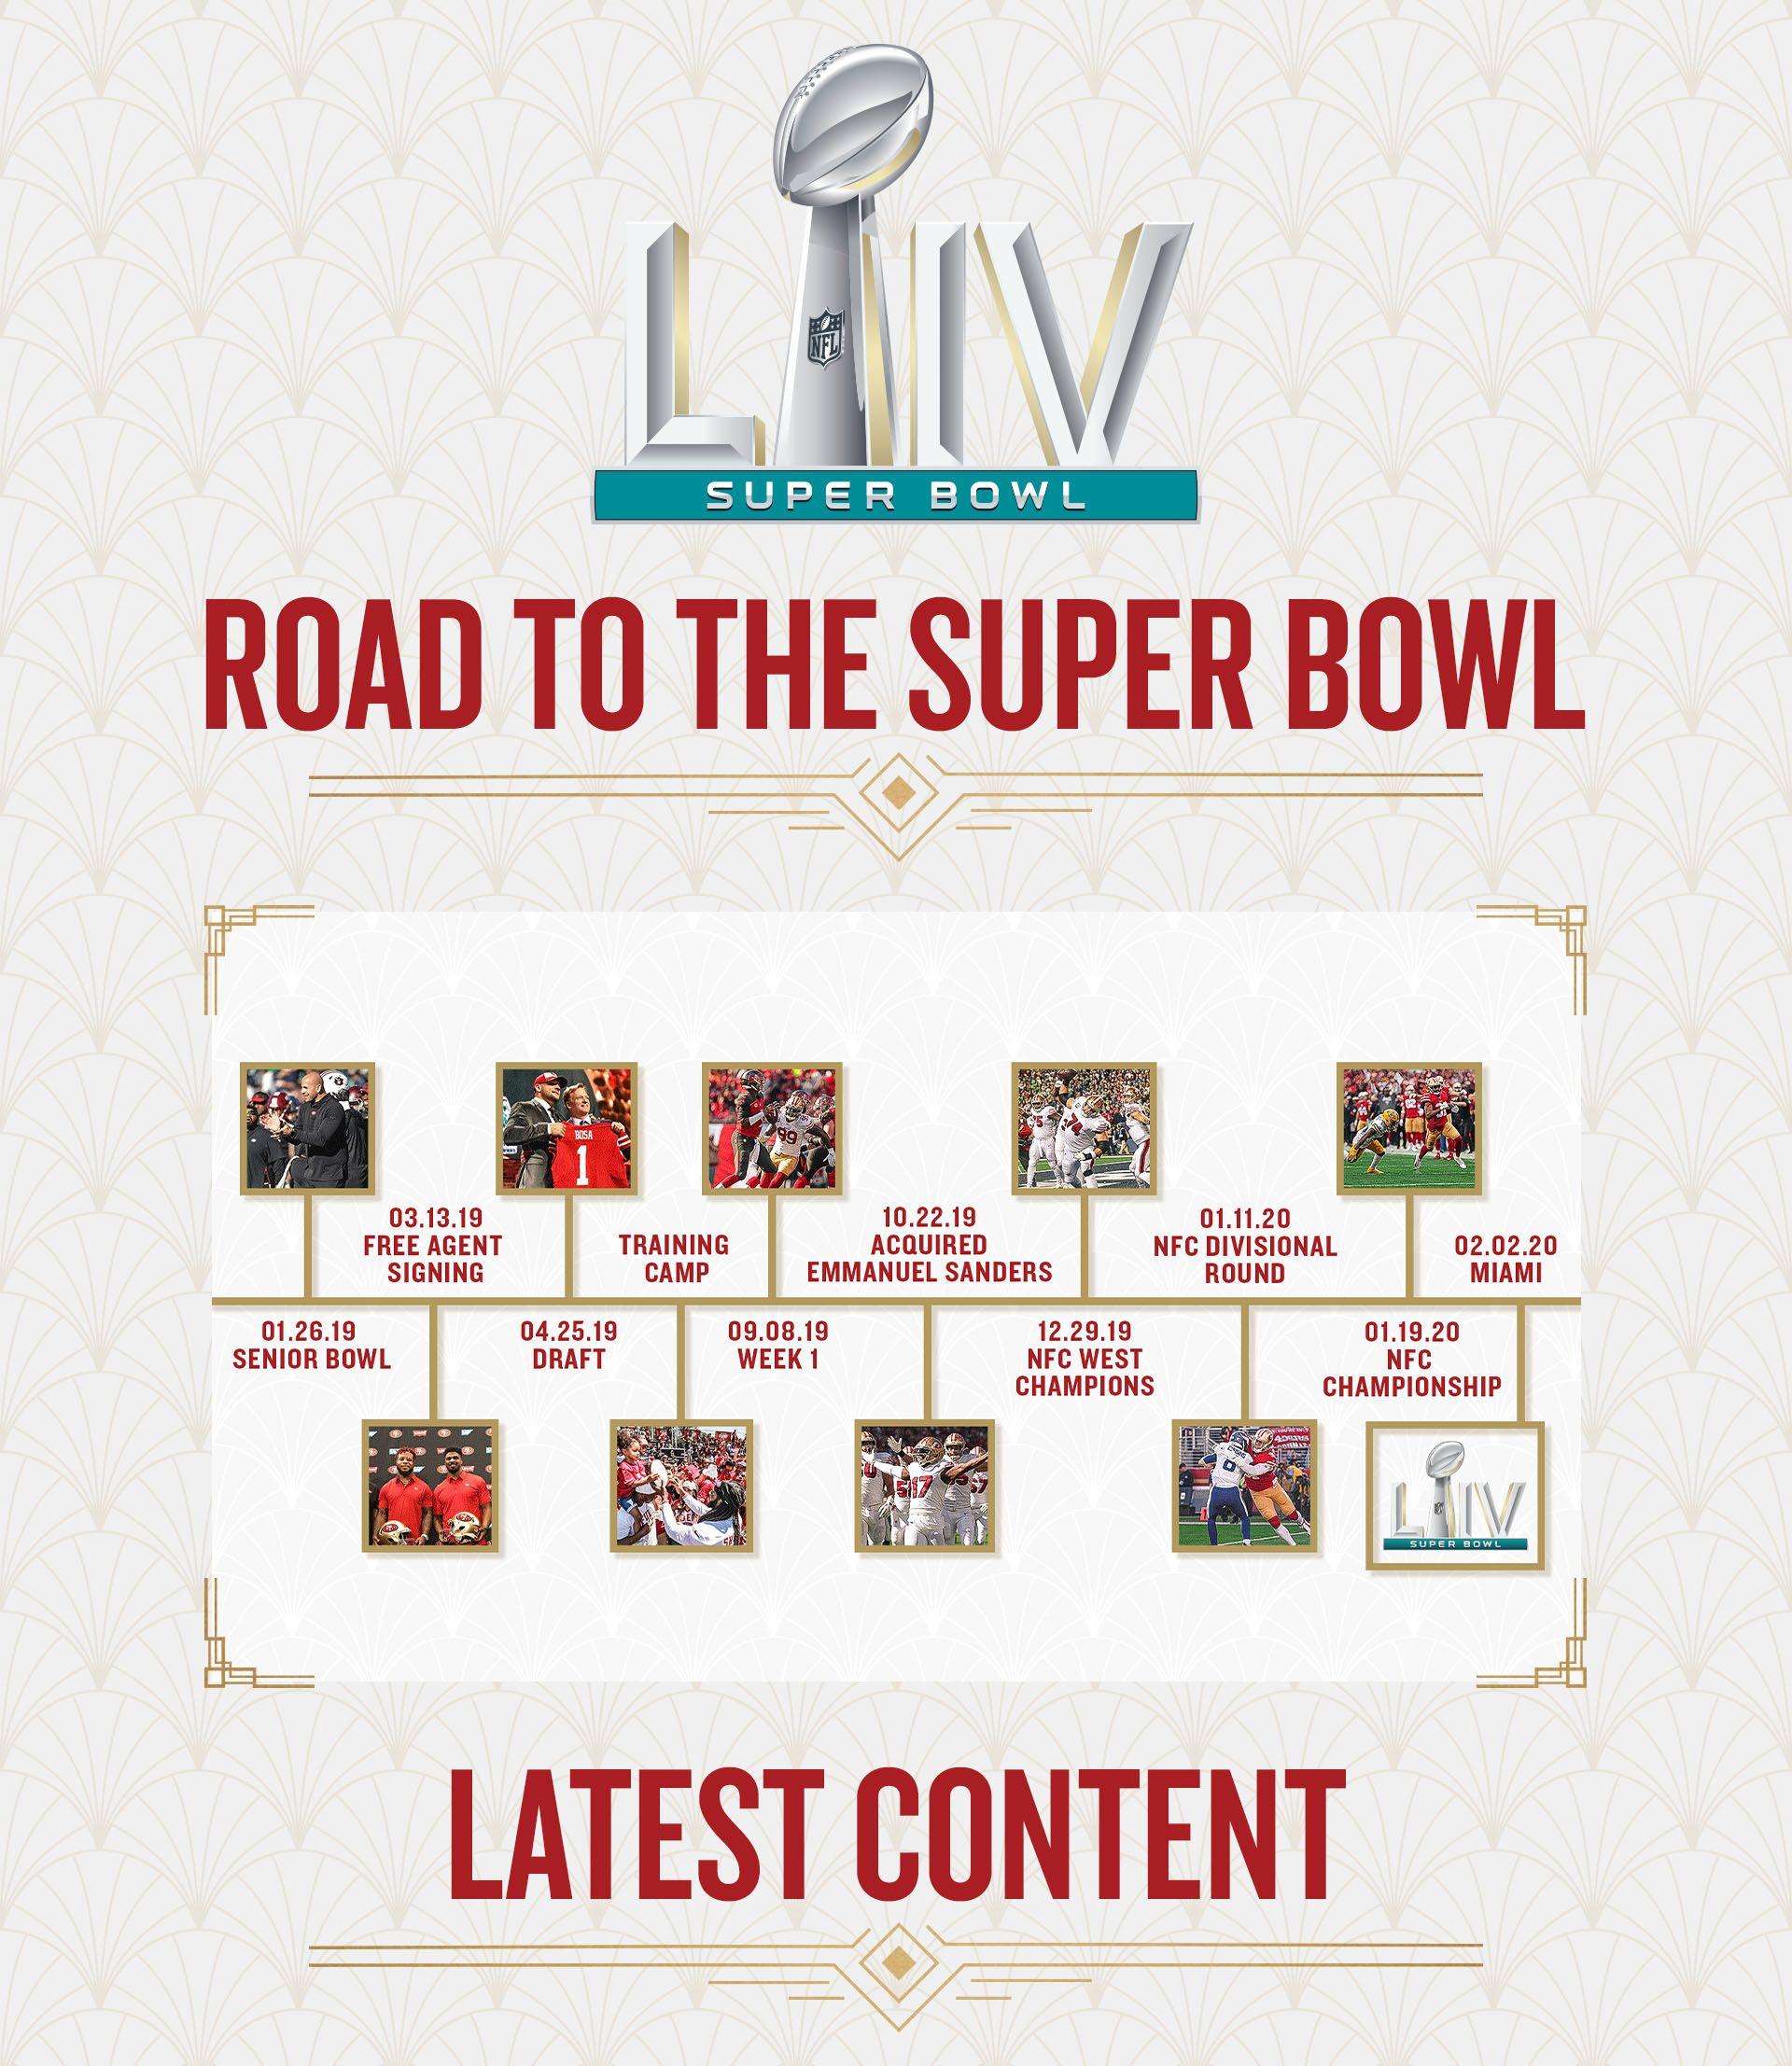 SuperBowl-Webpage-Road + Content